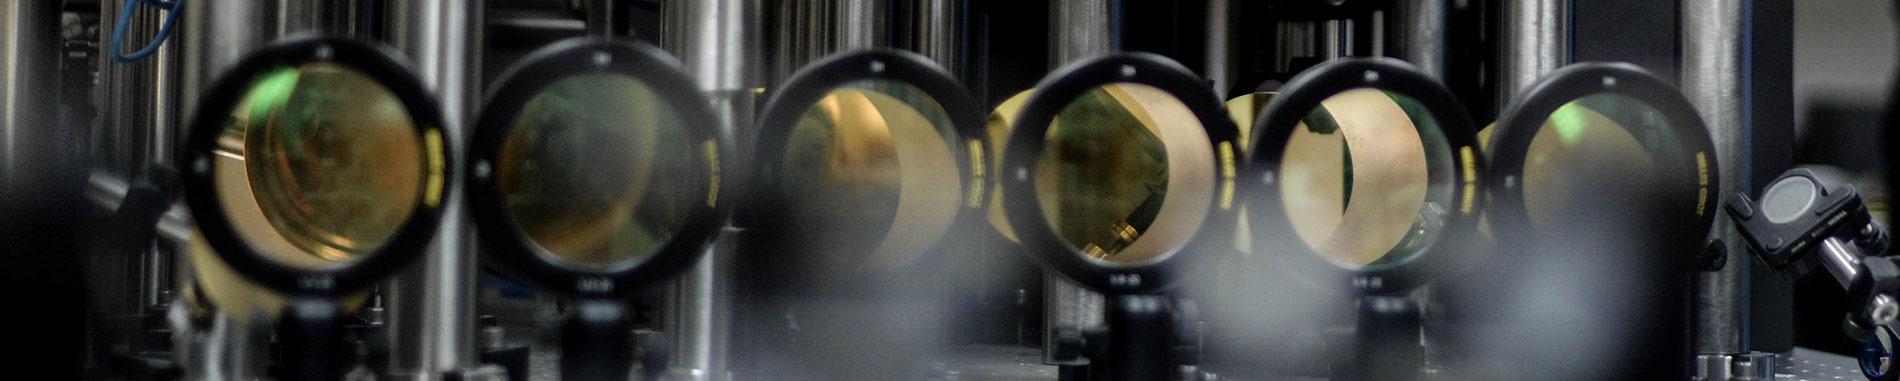 Optics for the magneto-optical trap